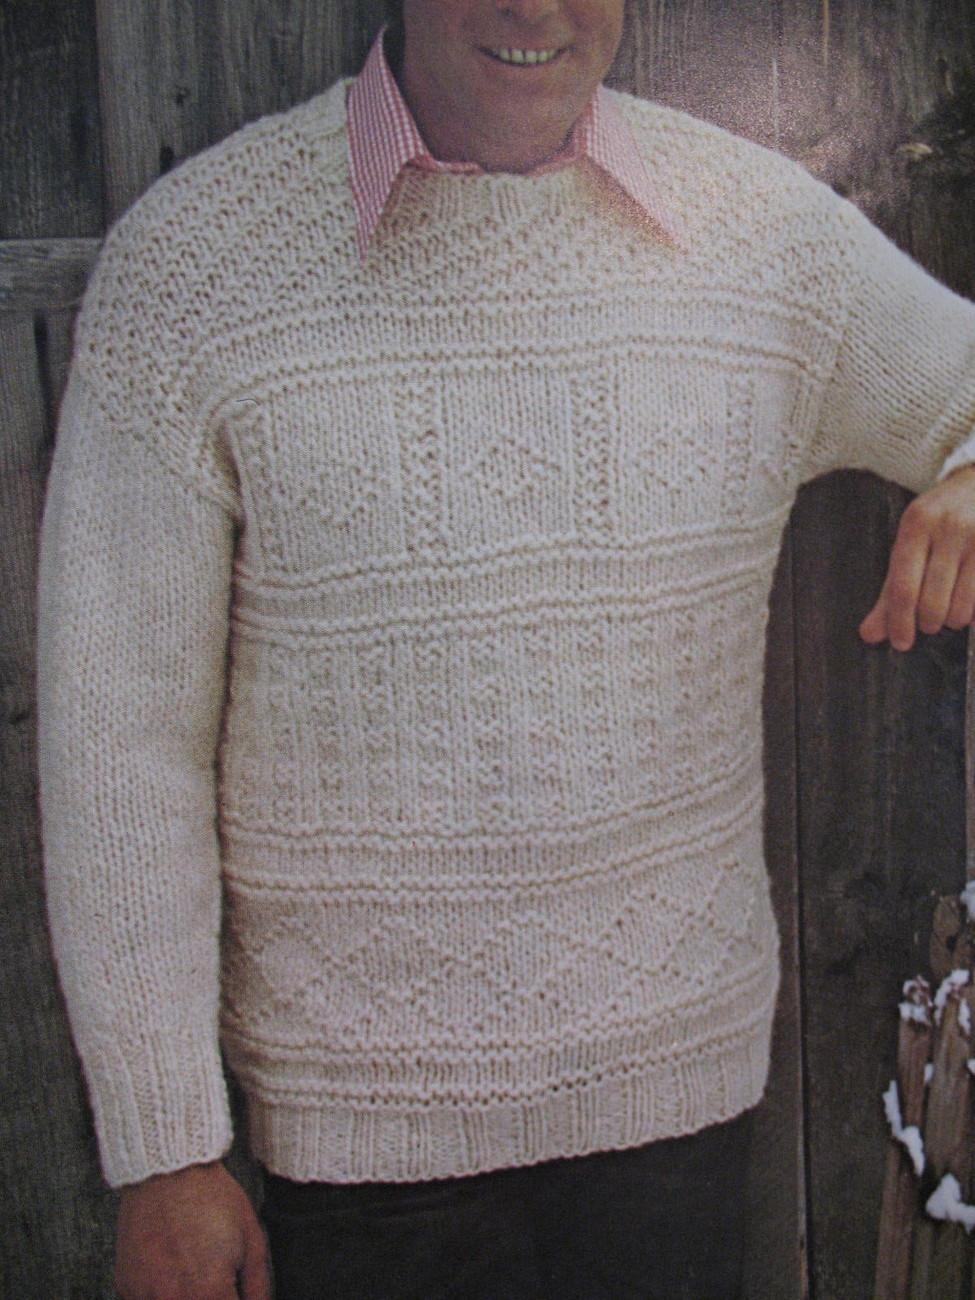 Knitting Patterns Lopi Wool : Reynolds Lopi Wool Sweater Wrap Jacket Knitting Pattern etc - Adult Clothing